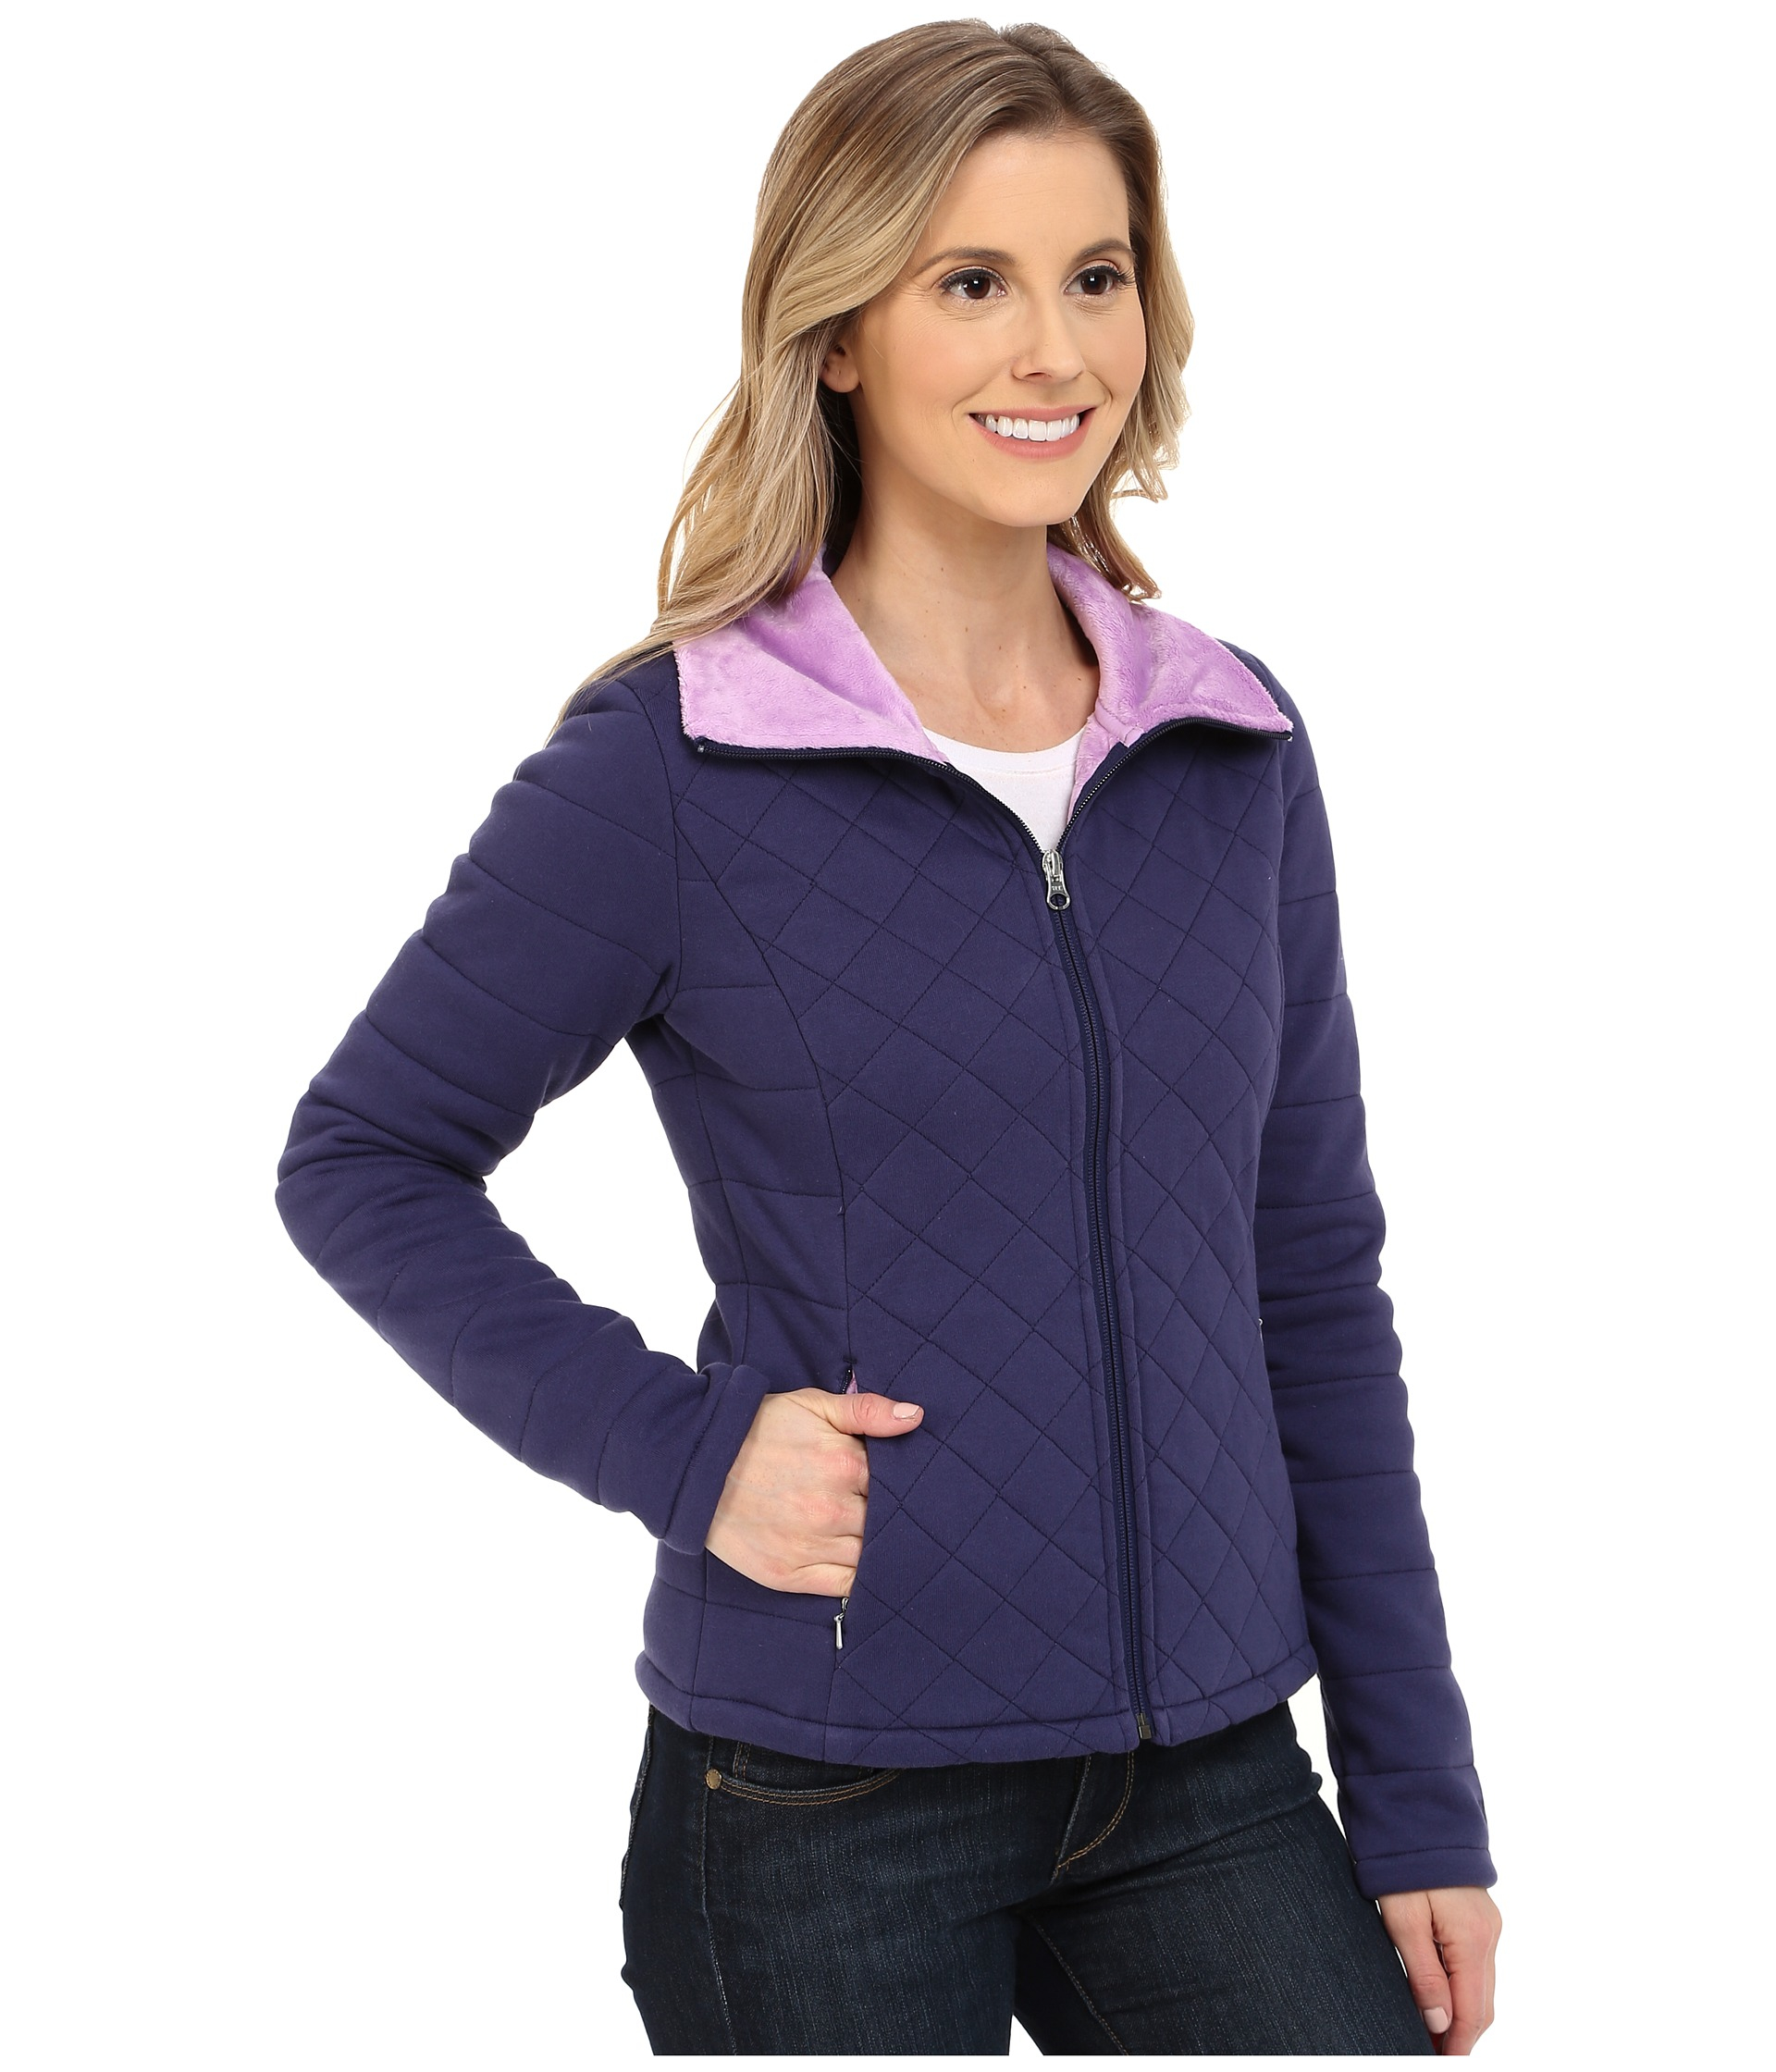 845878d44 Women's Blue Caroluna Crop Jacket